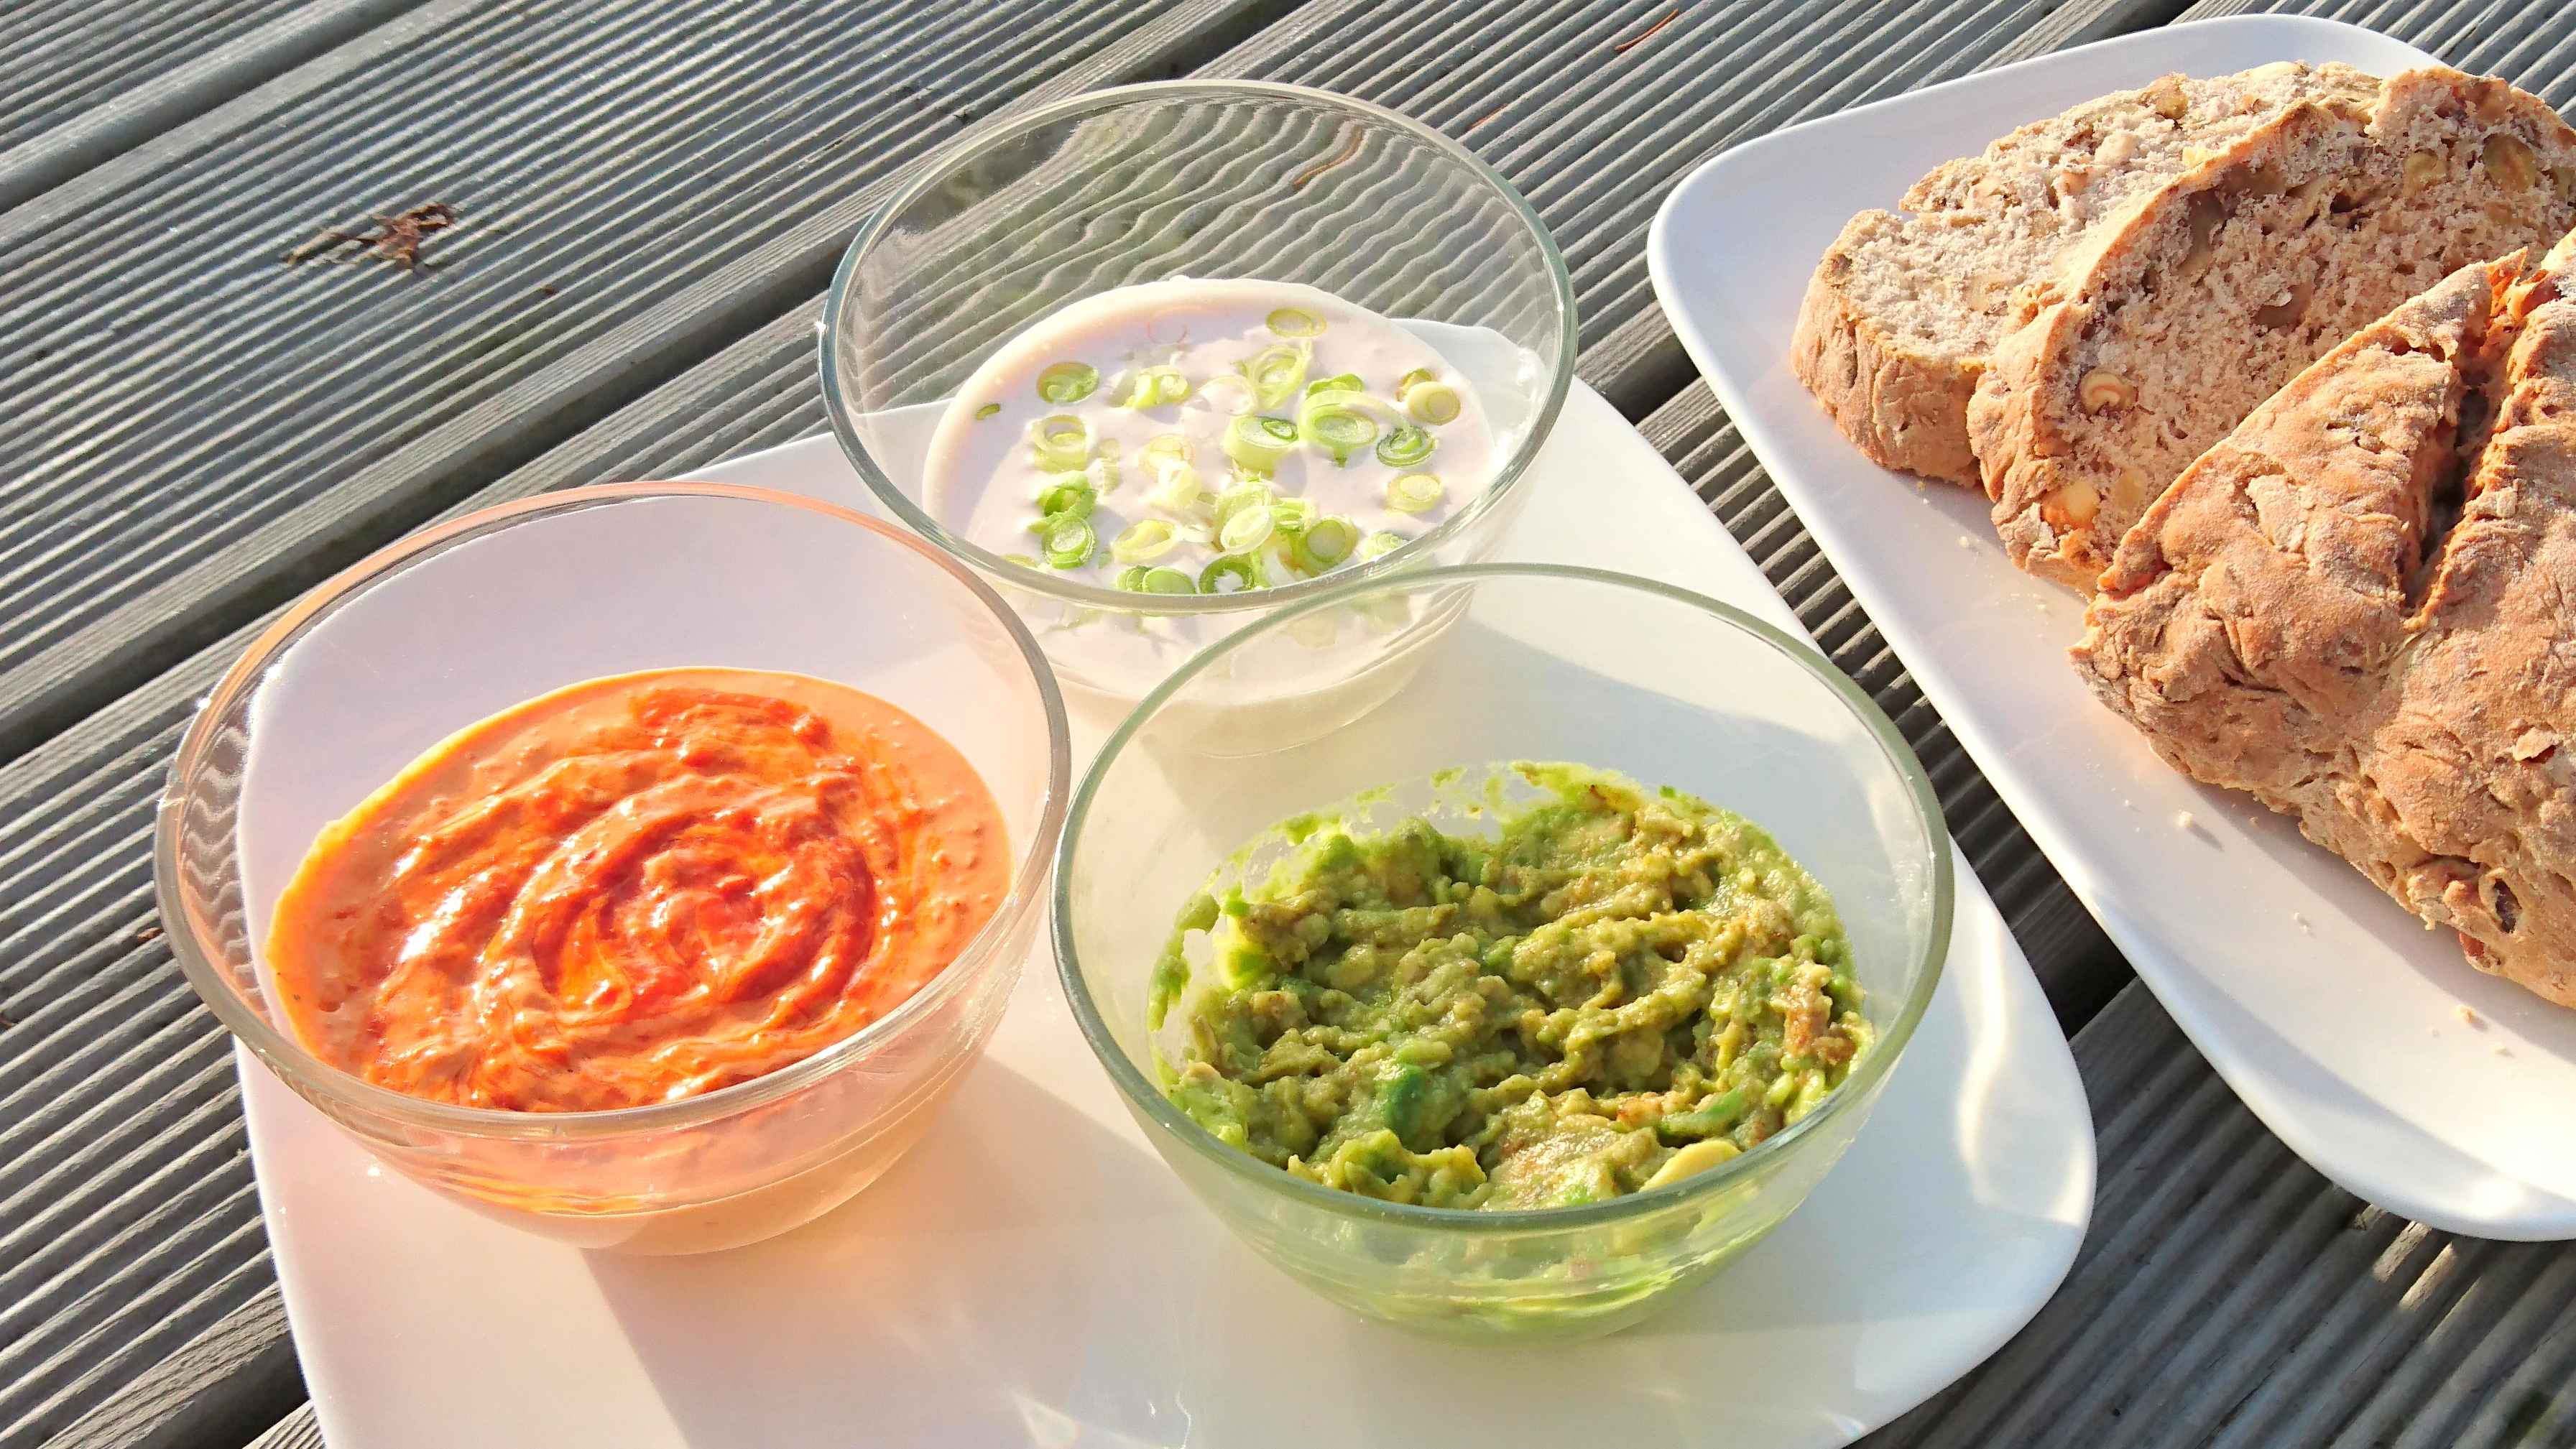 Dreierlei Dips - Paprika Quark, Mandel-Guacamole und Lachs-Creme